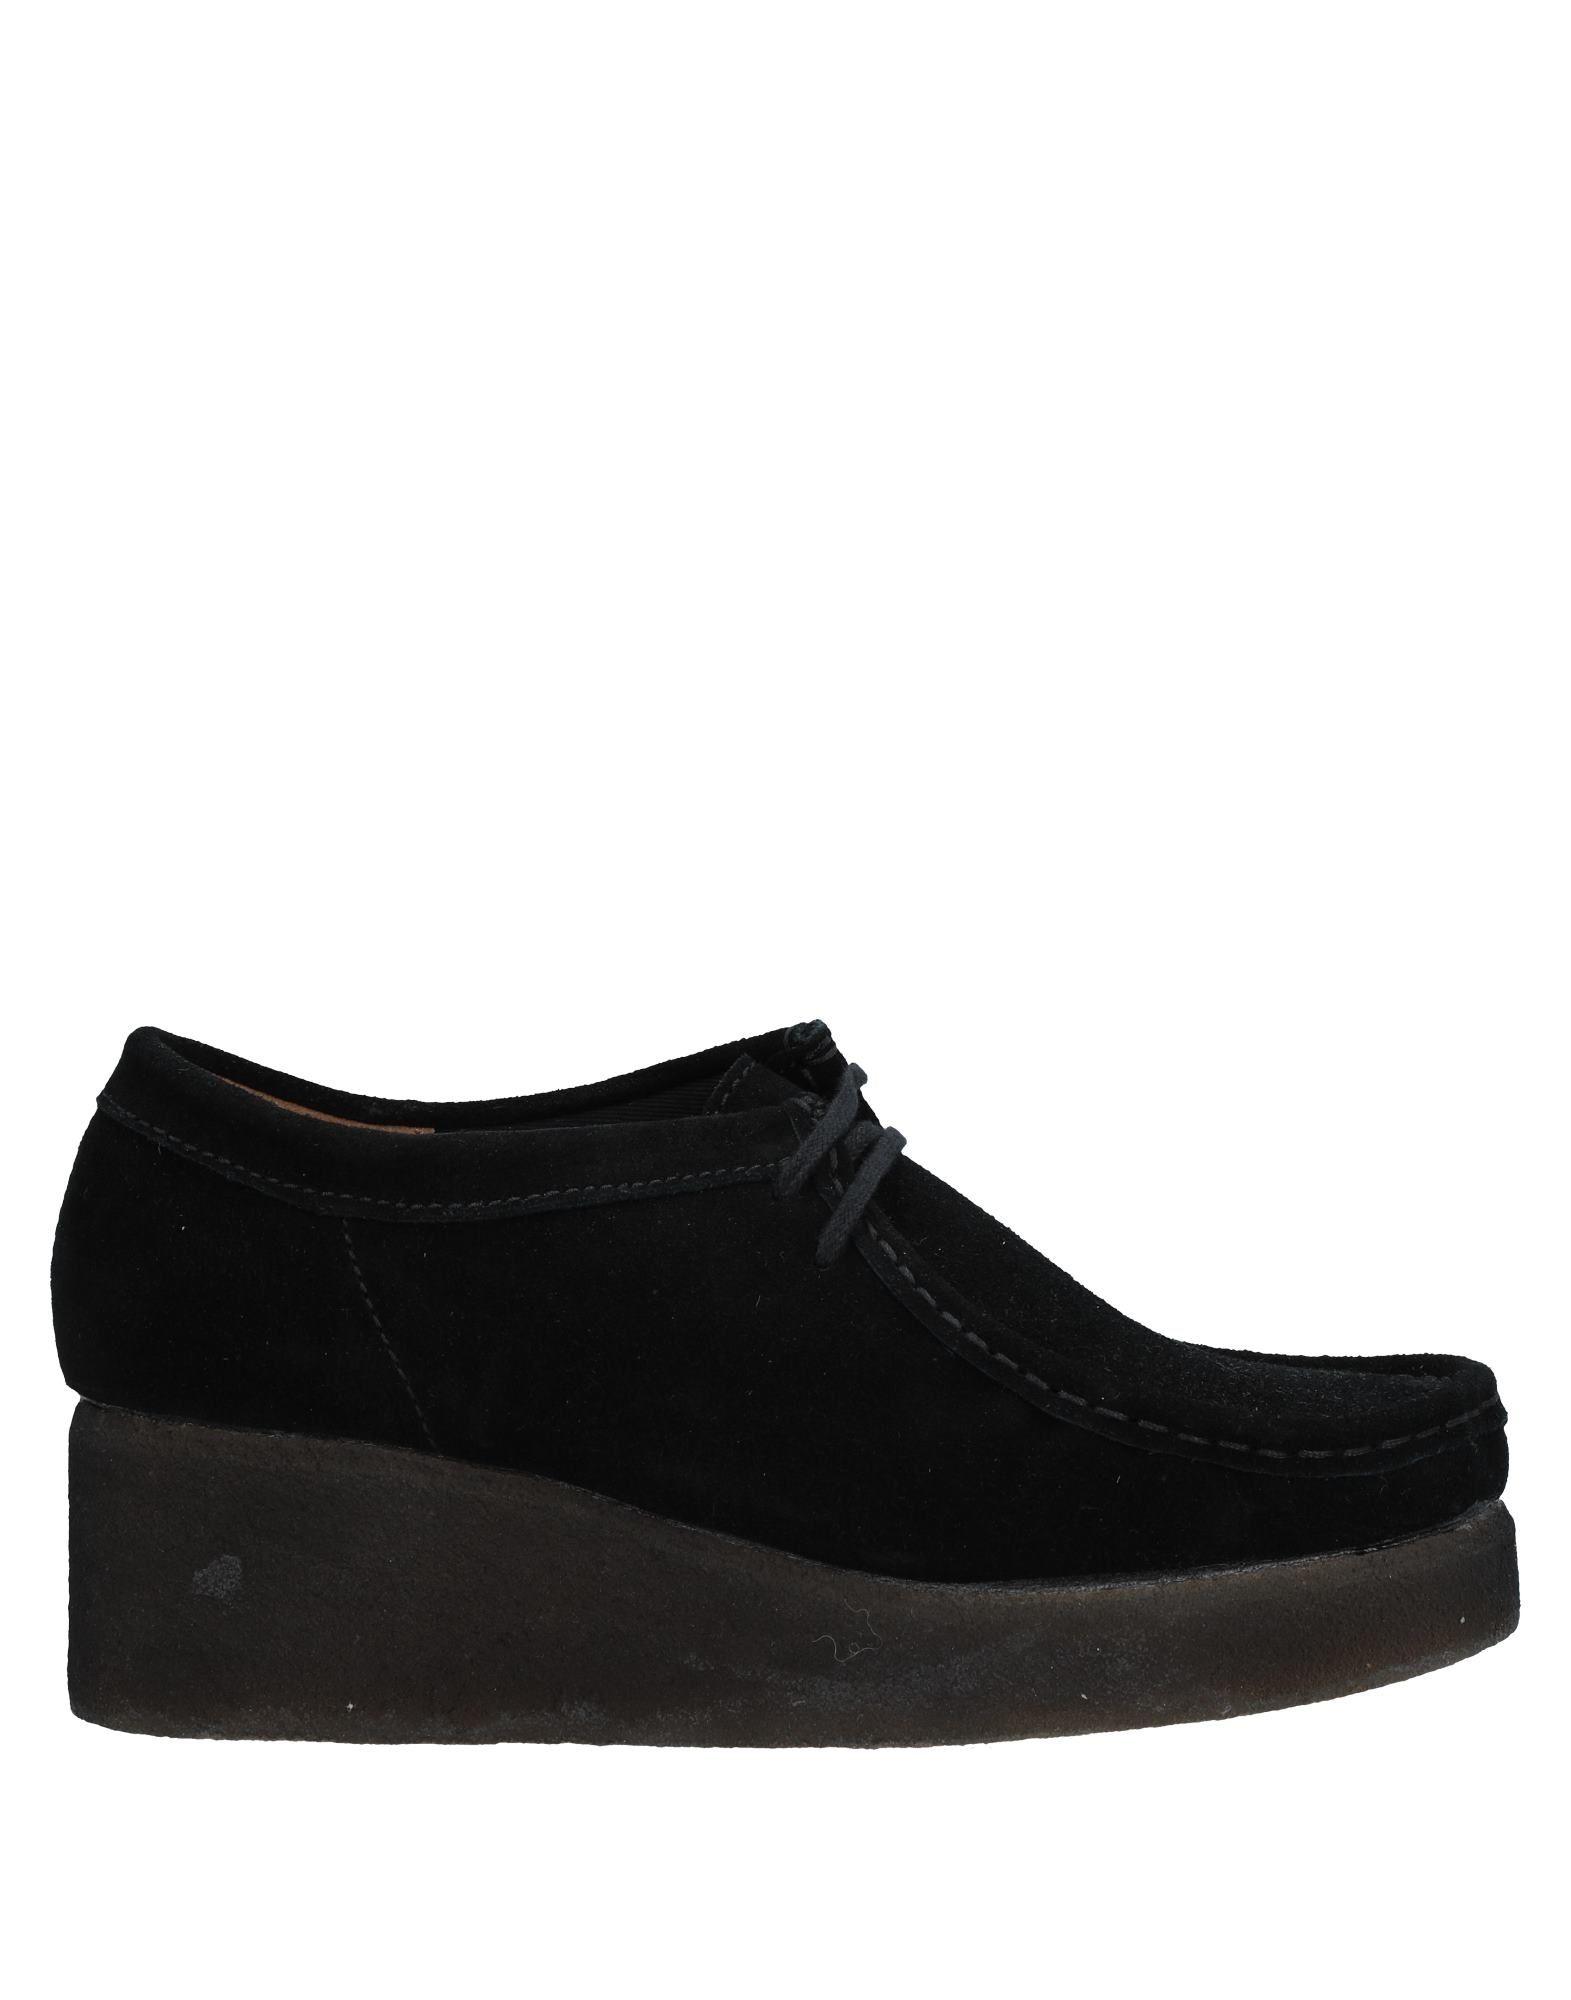 CLARKS ORIGINALS Обувь на шнурках clarks originals